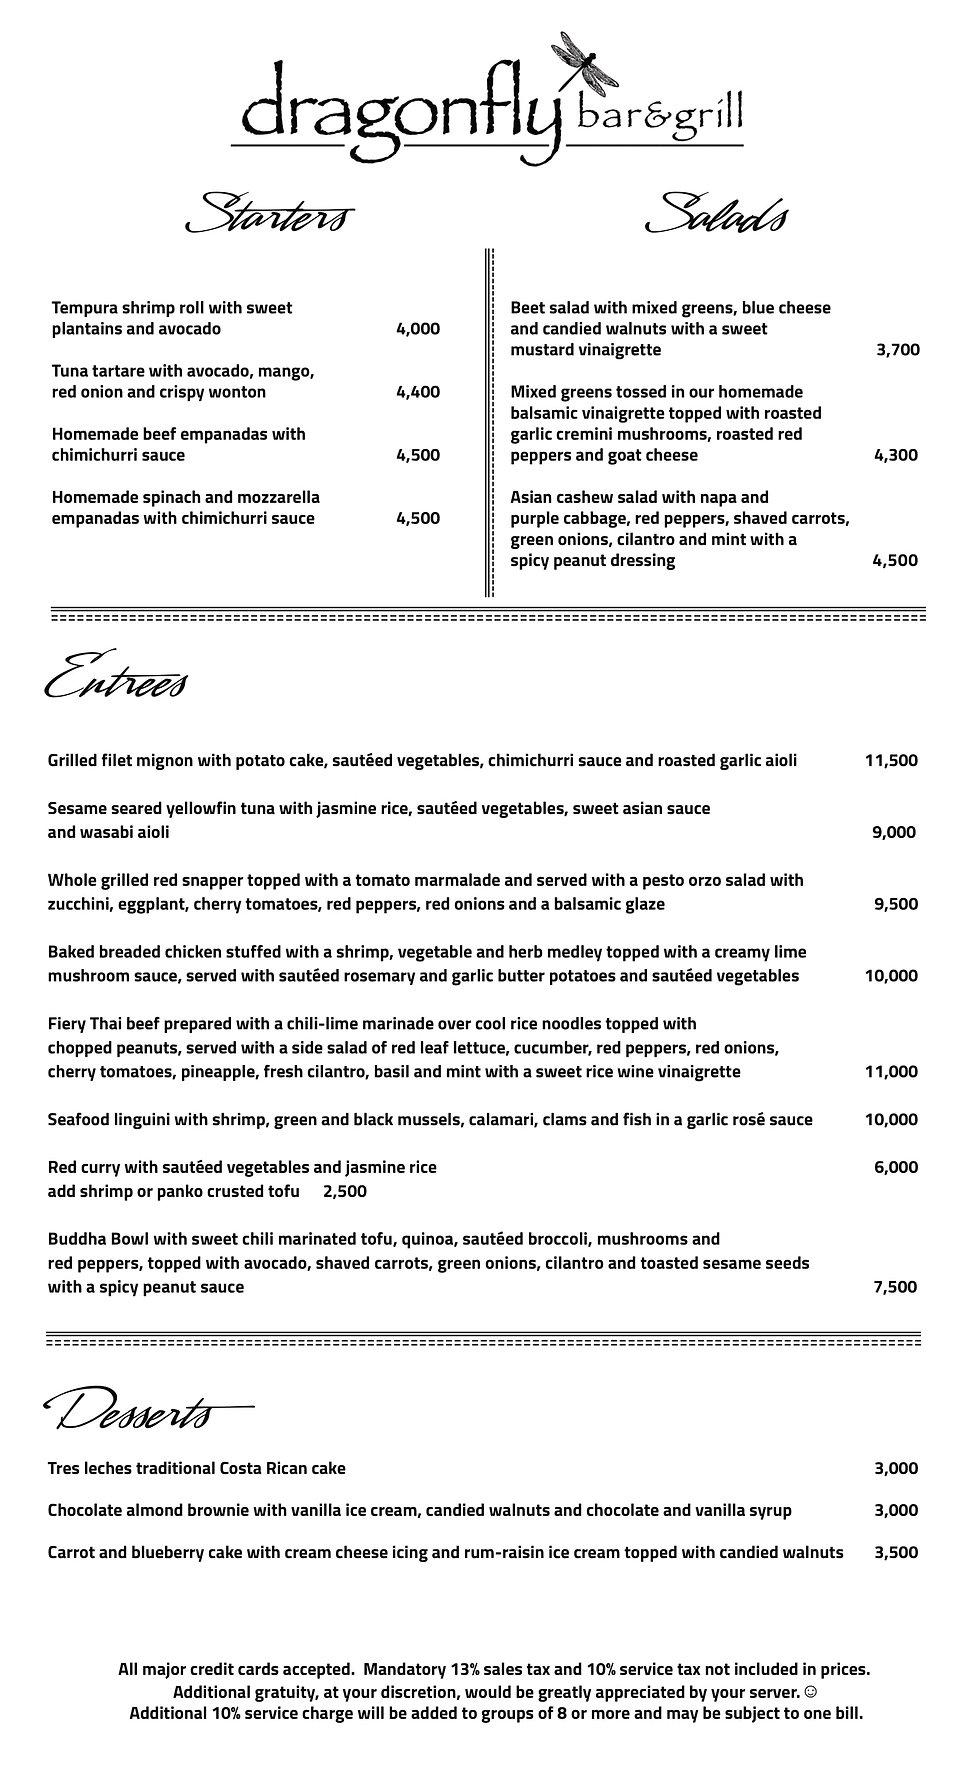 dragonfly menu-1.jpg